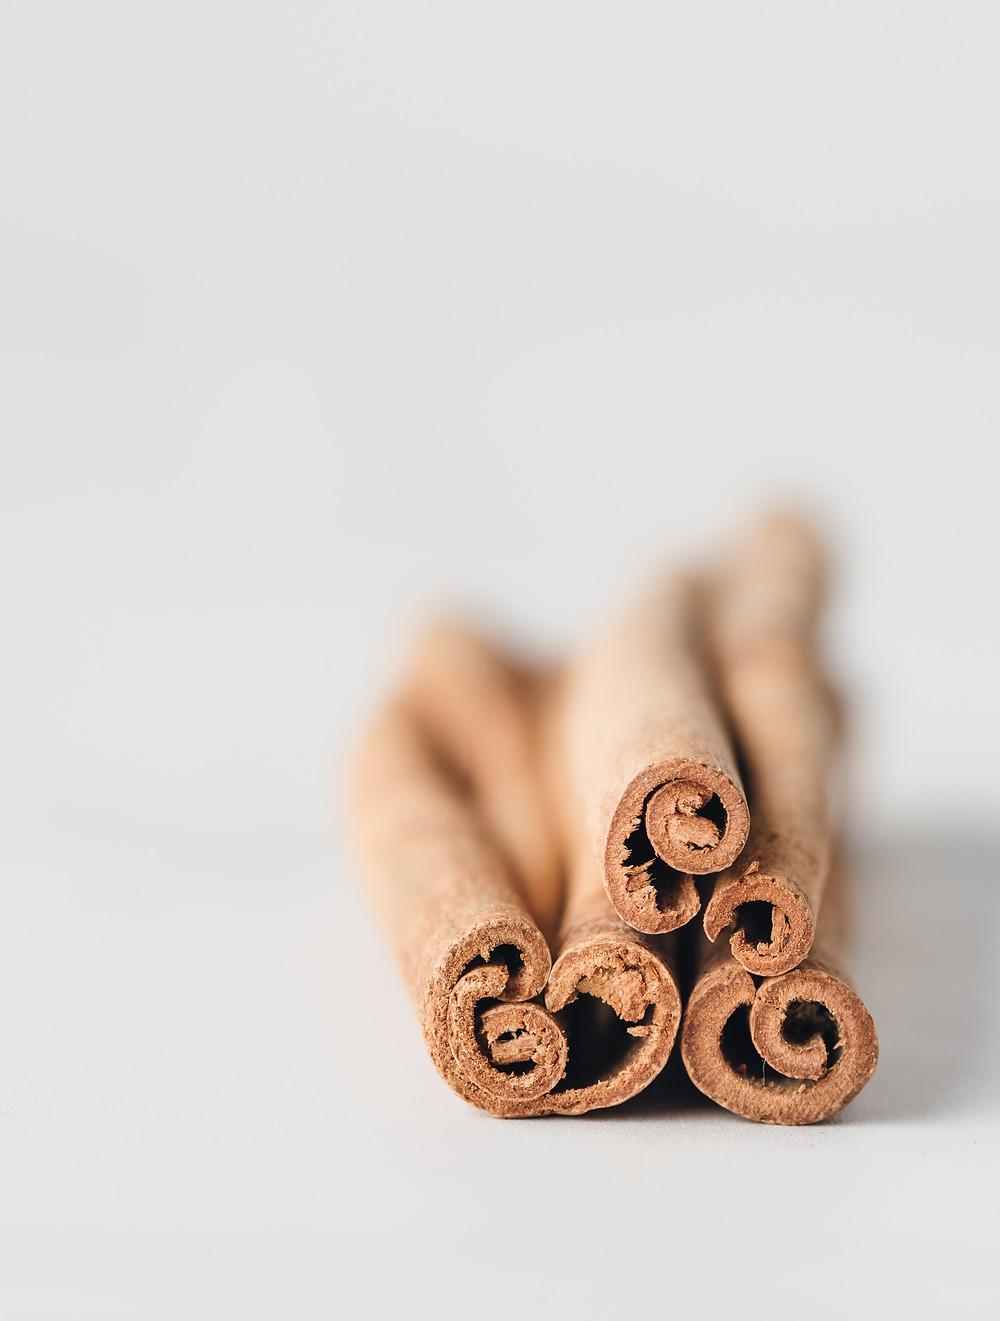 Cinnamon - Cinnamaldehyde Terpene Isolate Benefits